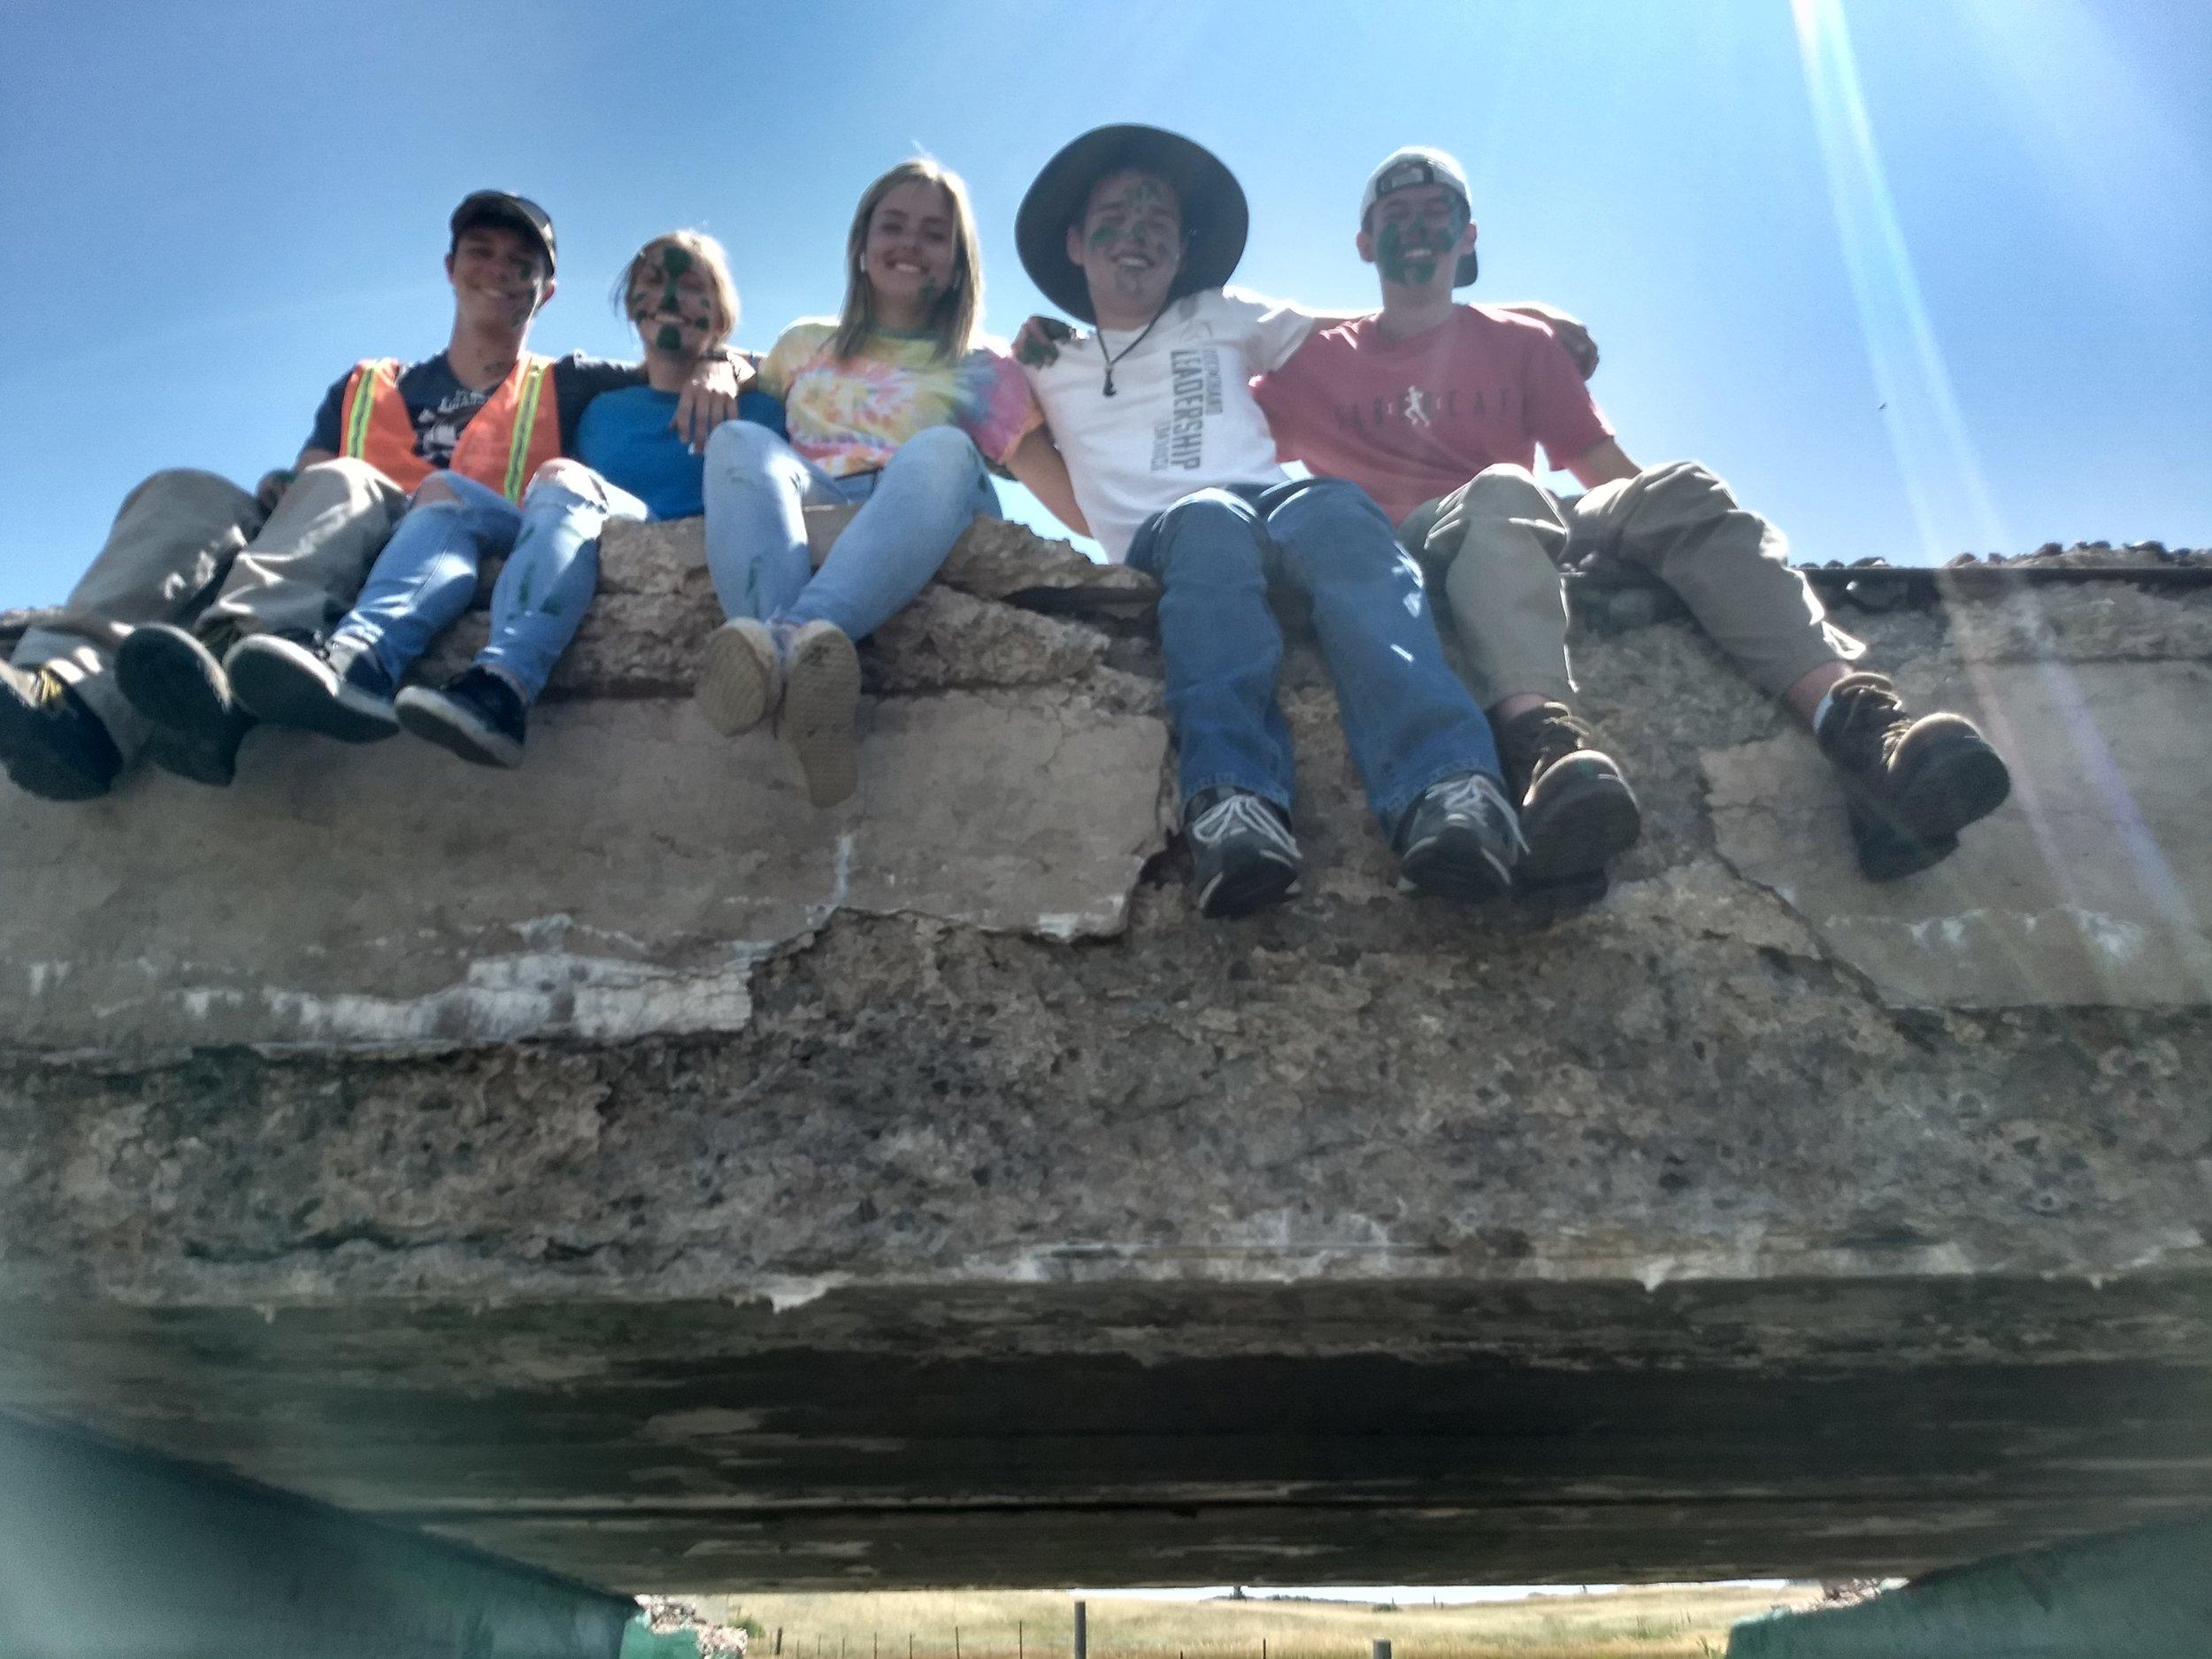 Sam, Avery, Ella, Trevan and Ben.